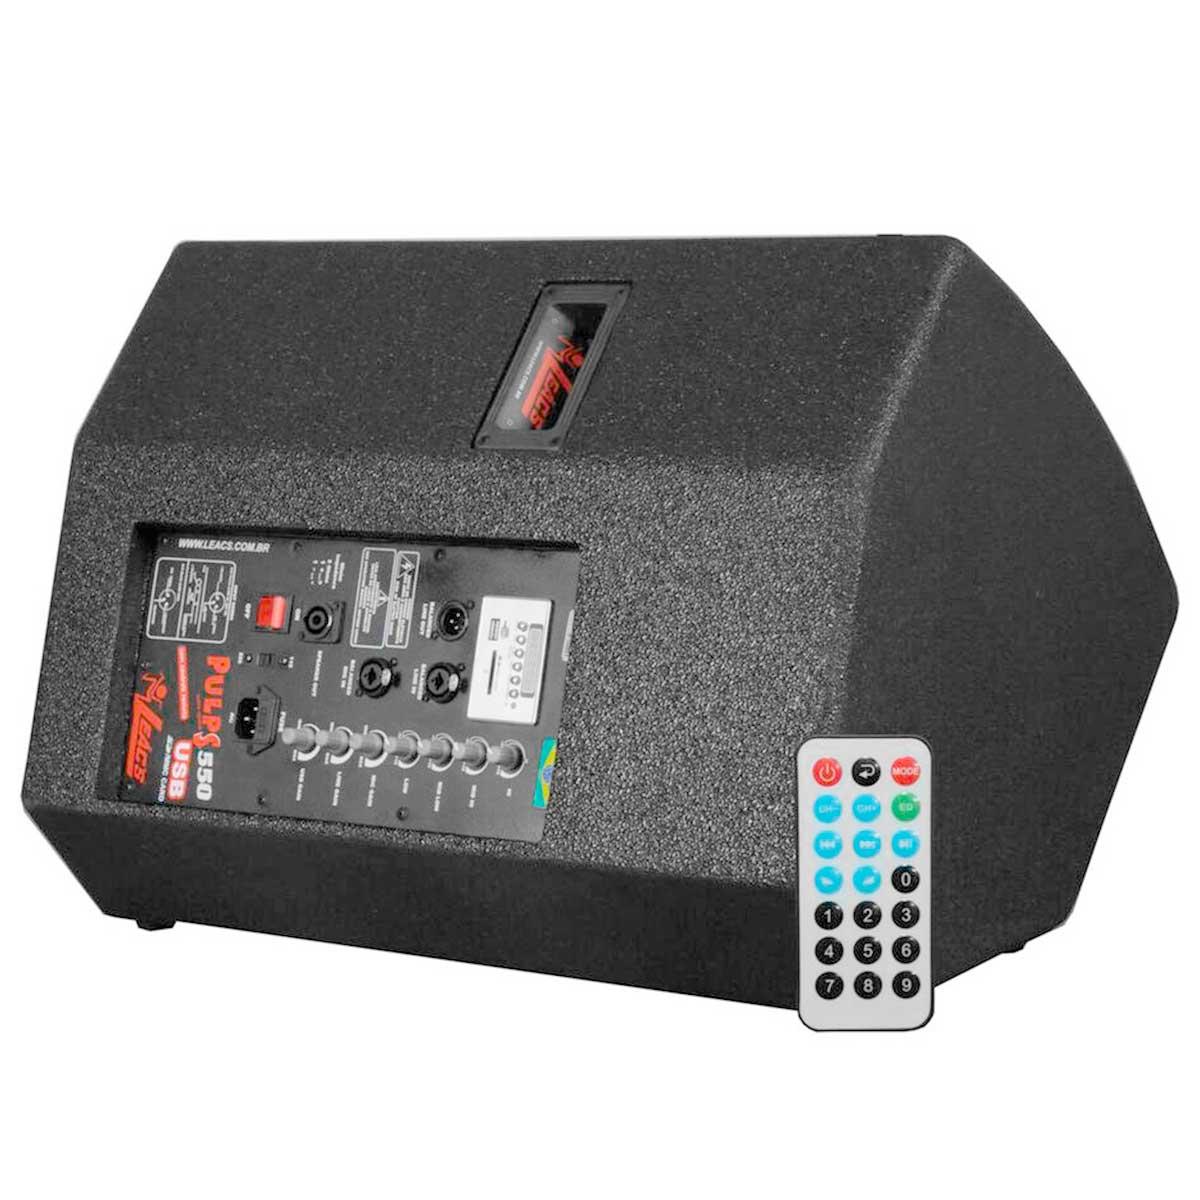 550A - Monitor Ativo 200W c/ Player USB Pulps 550 A - Leacs